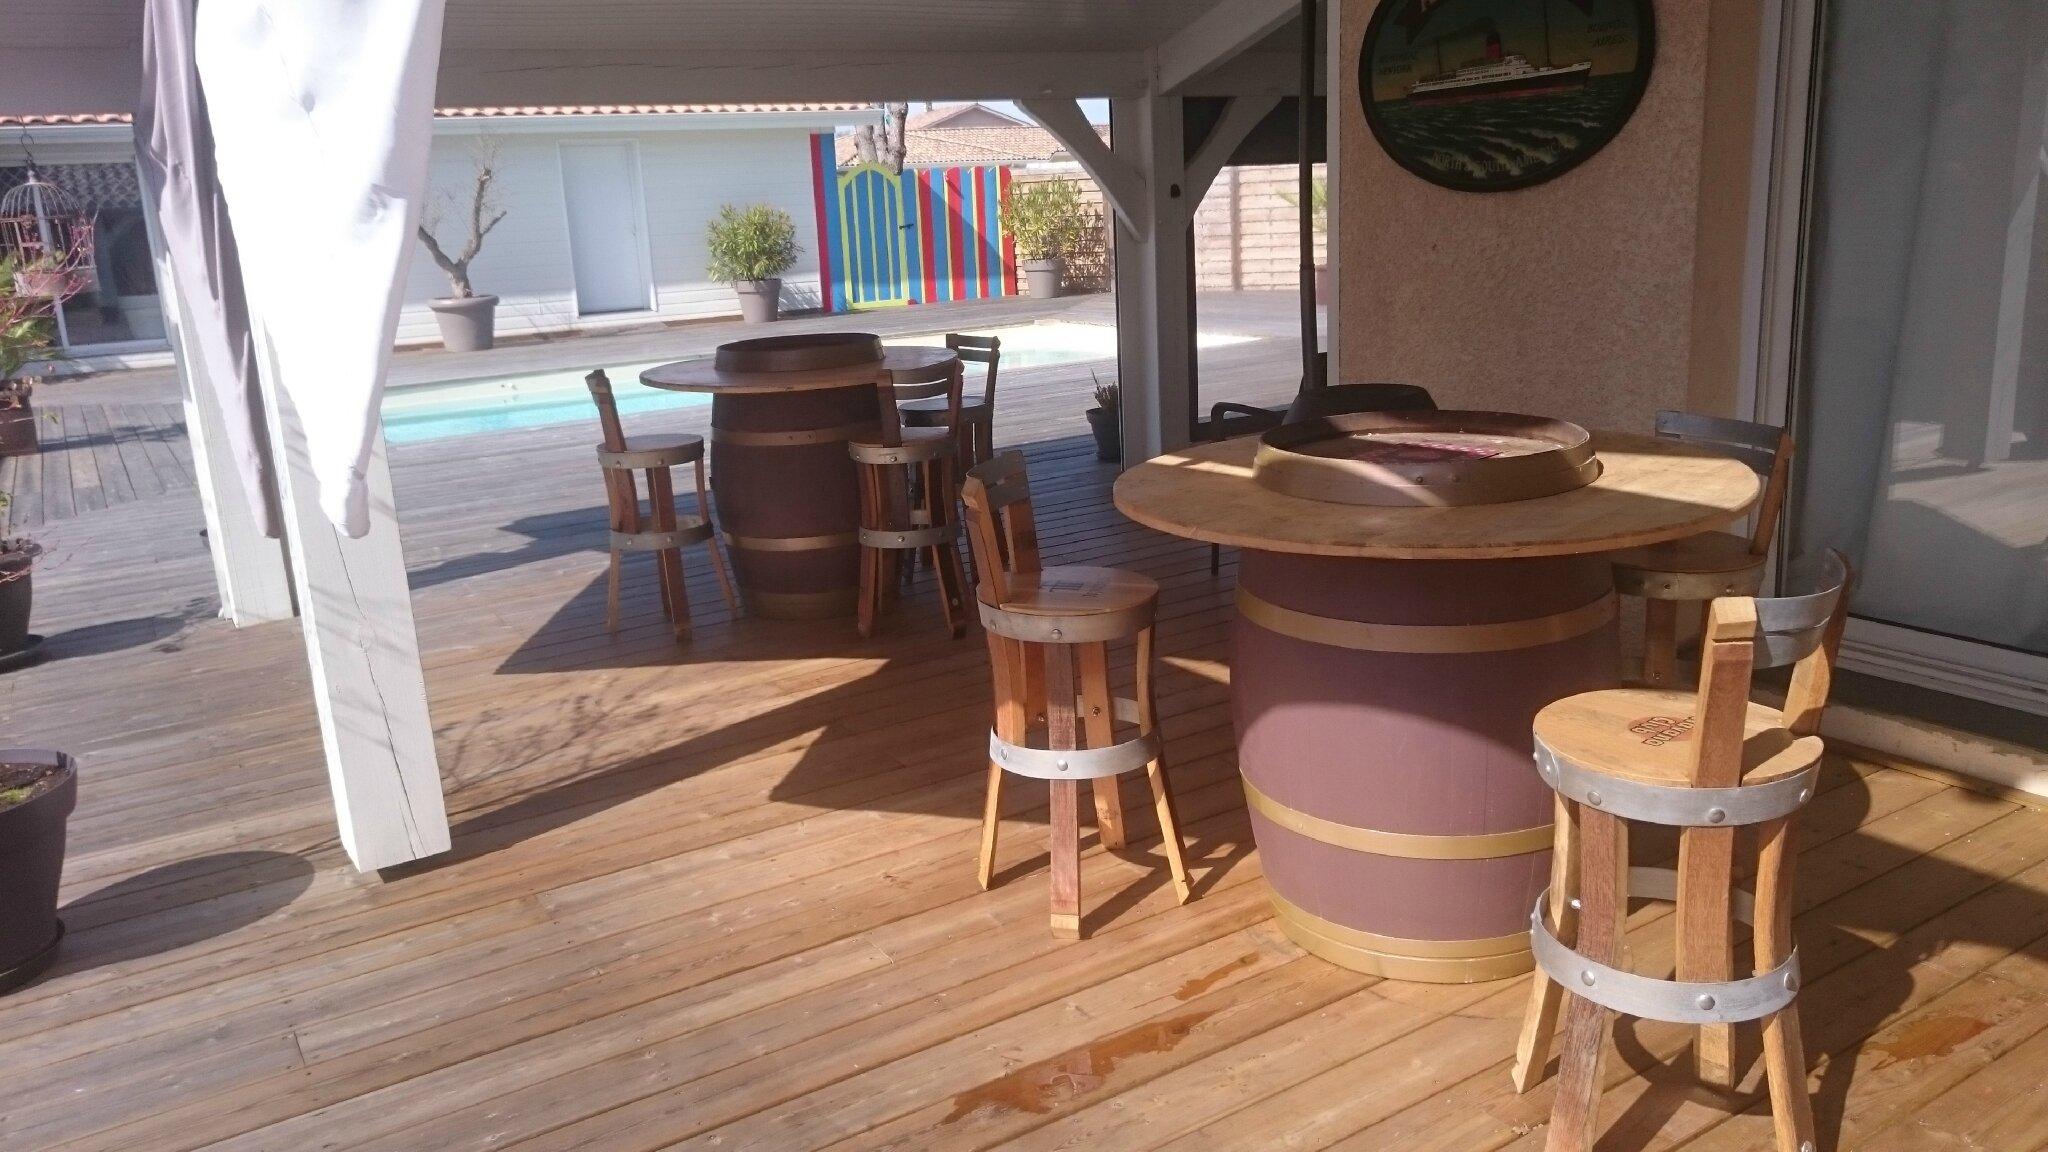 Creer un comptoir bar cuisine etape 1 ilot cuisine ikea - Fabriquer comptoir bar ...